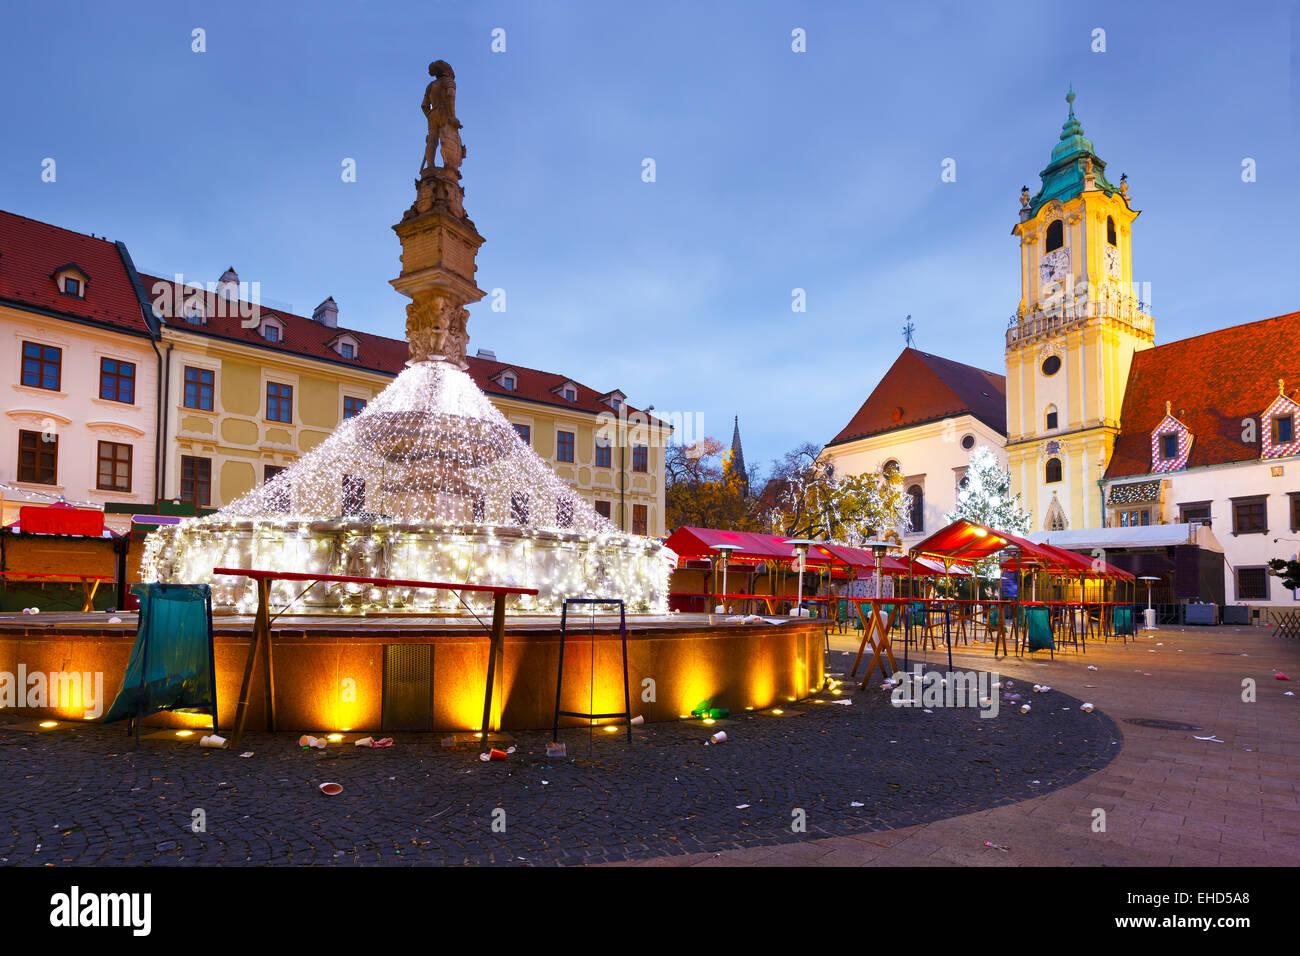 View of the main square in Bratislava, Slovakia. - Stock Image